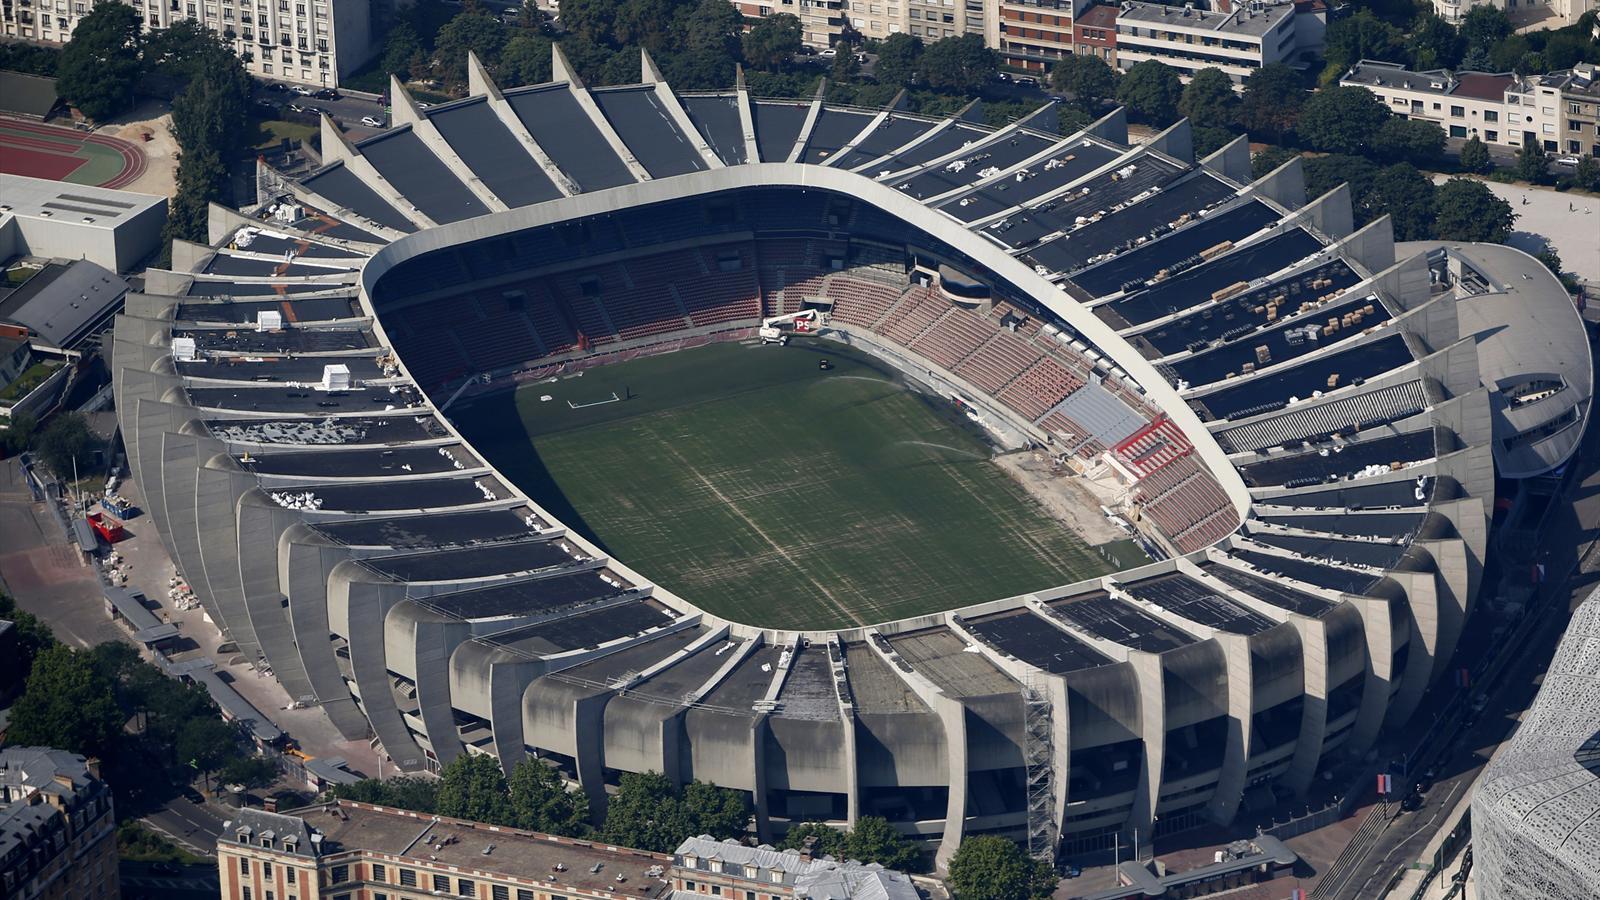 paris st germain stadion